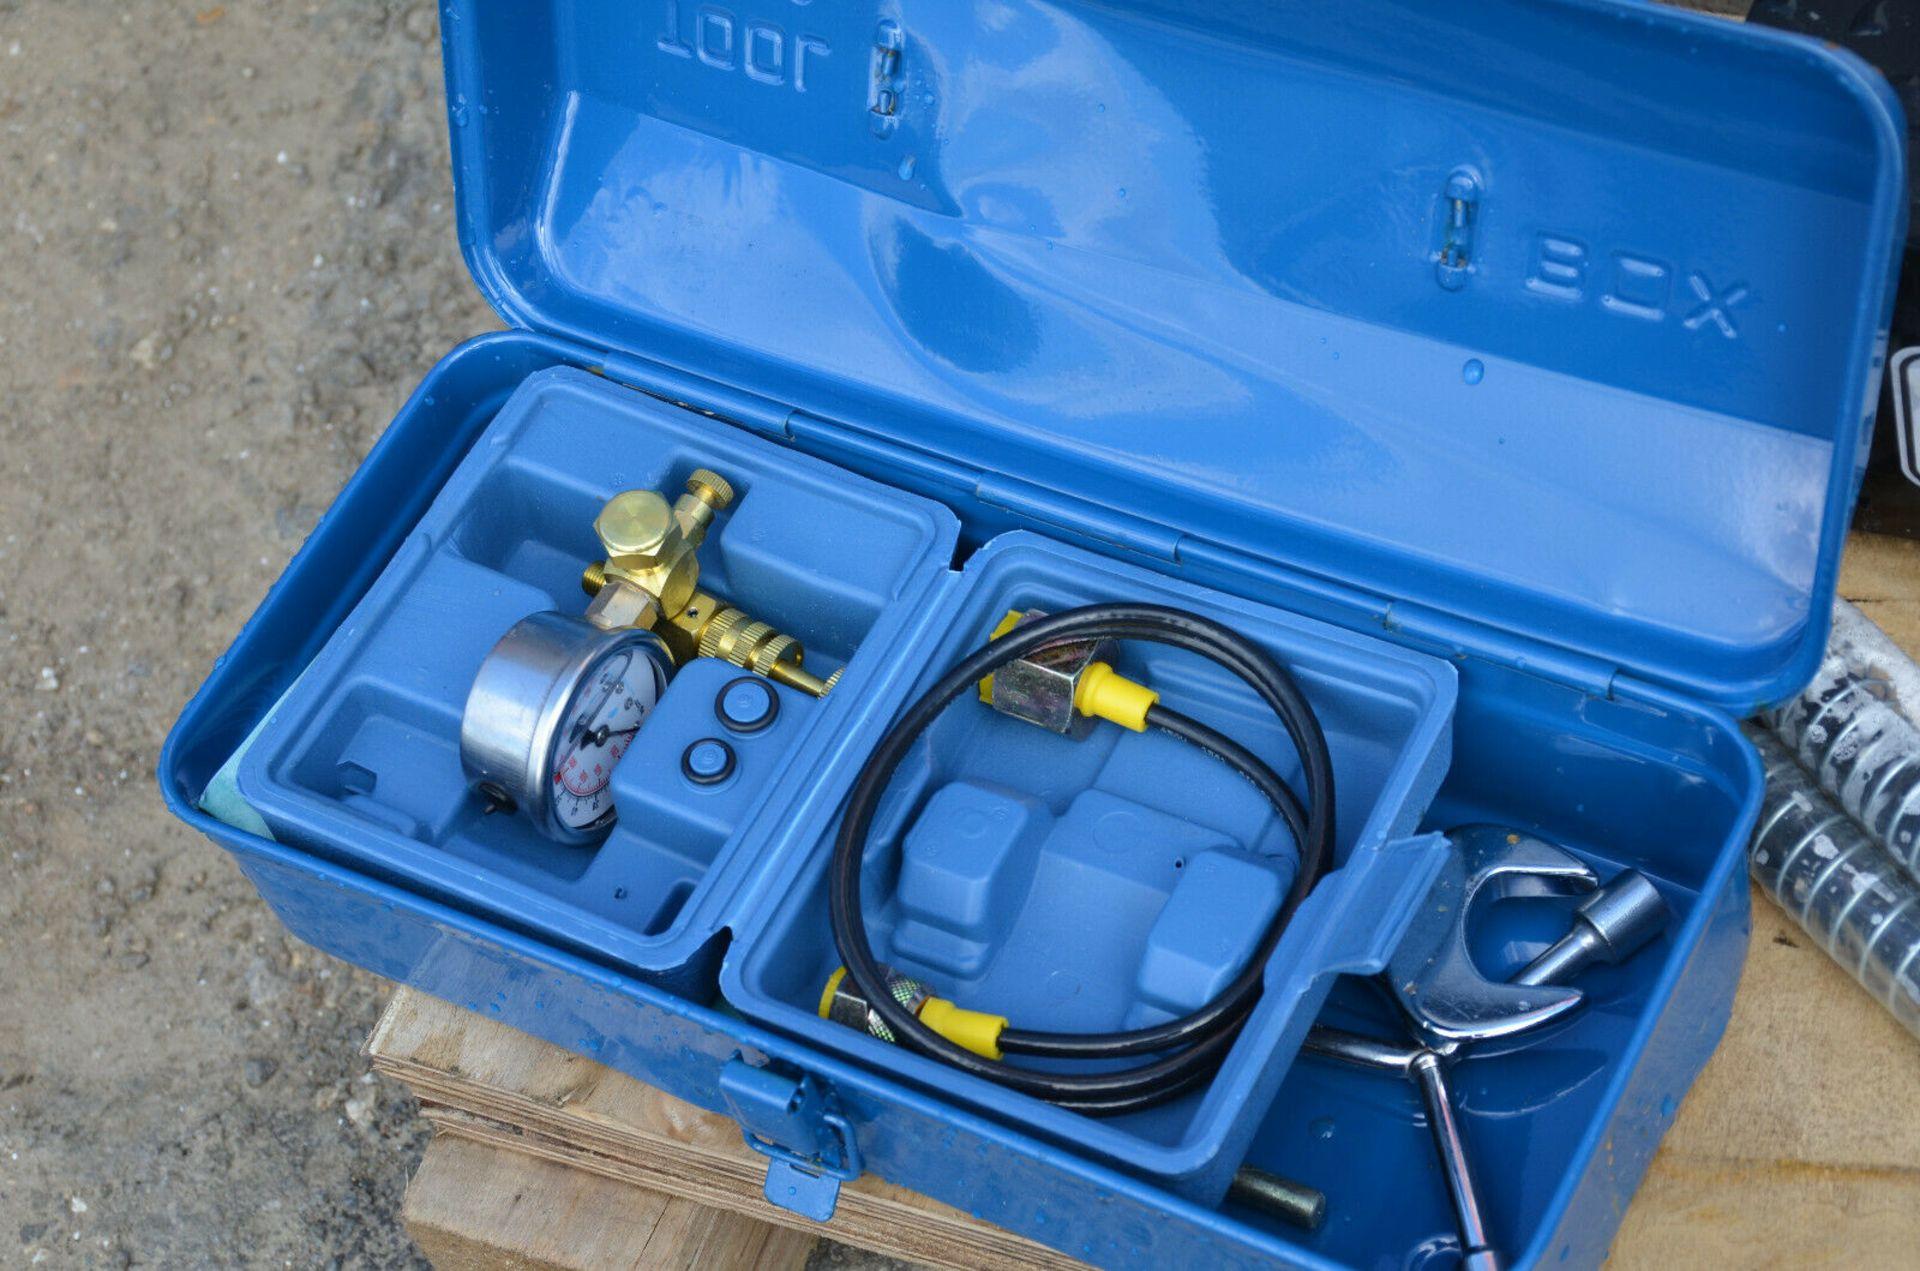 SSPSC SB20 Hydraulic Breaker - Image 3 of 6